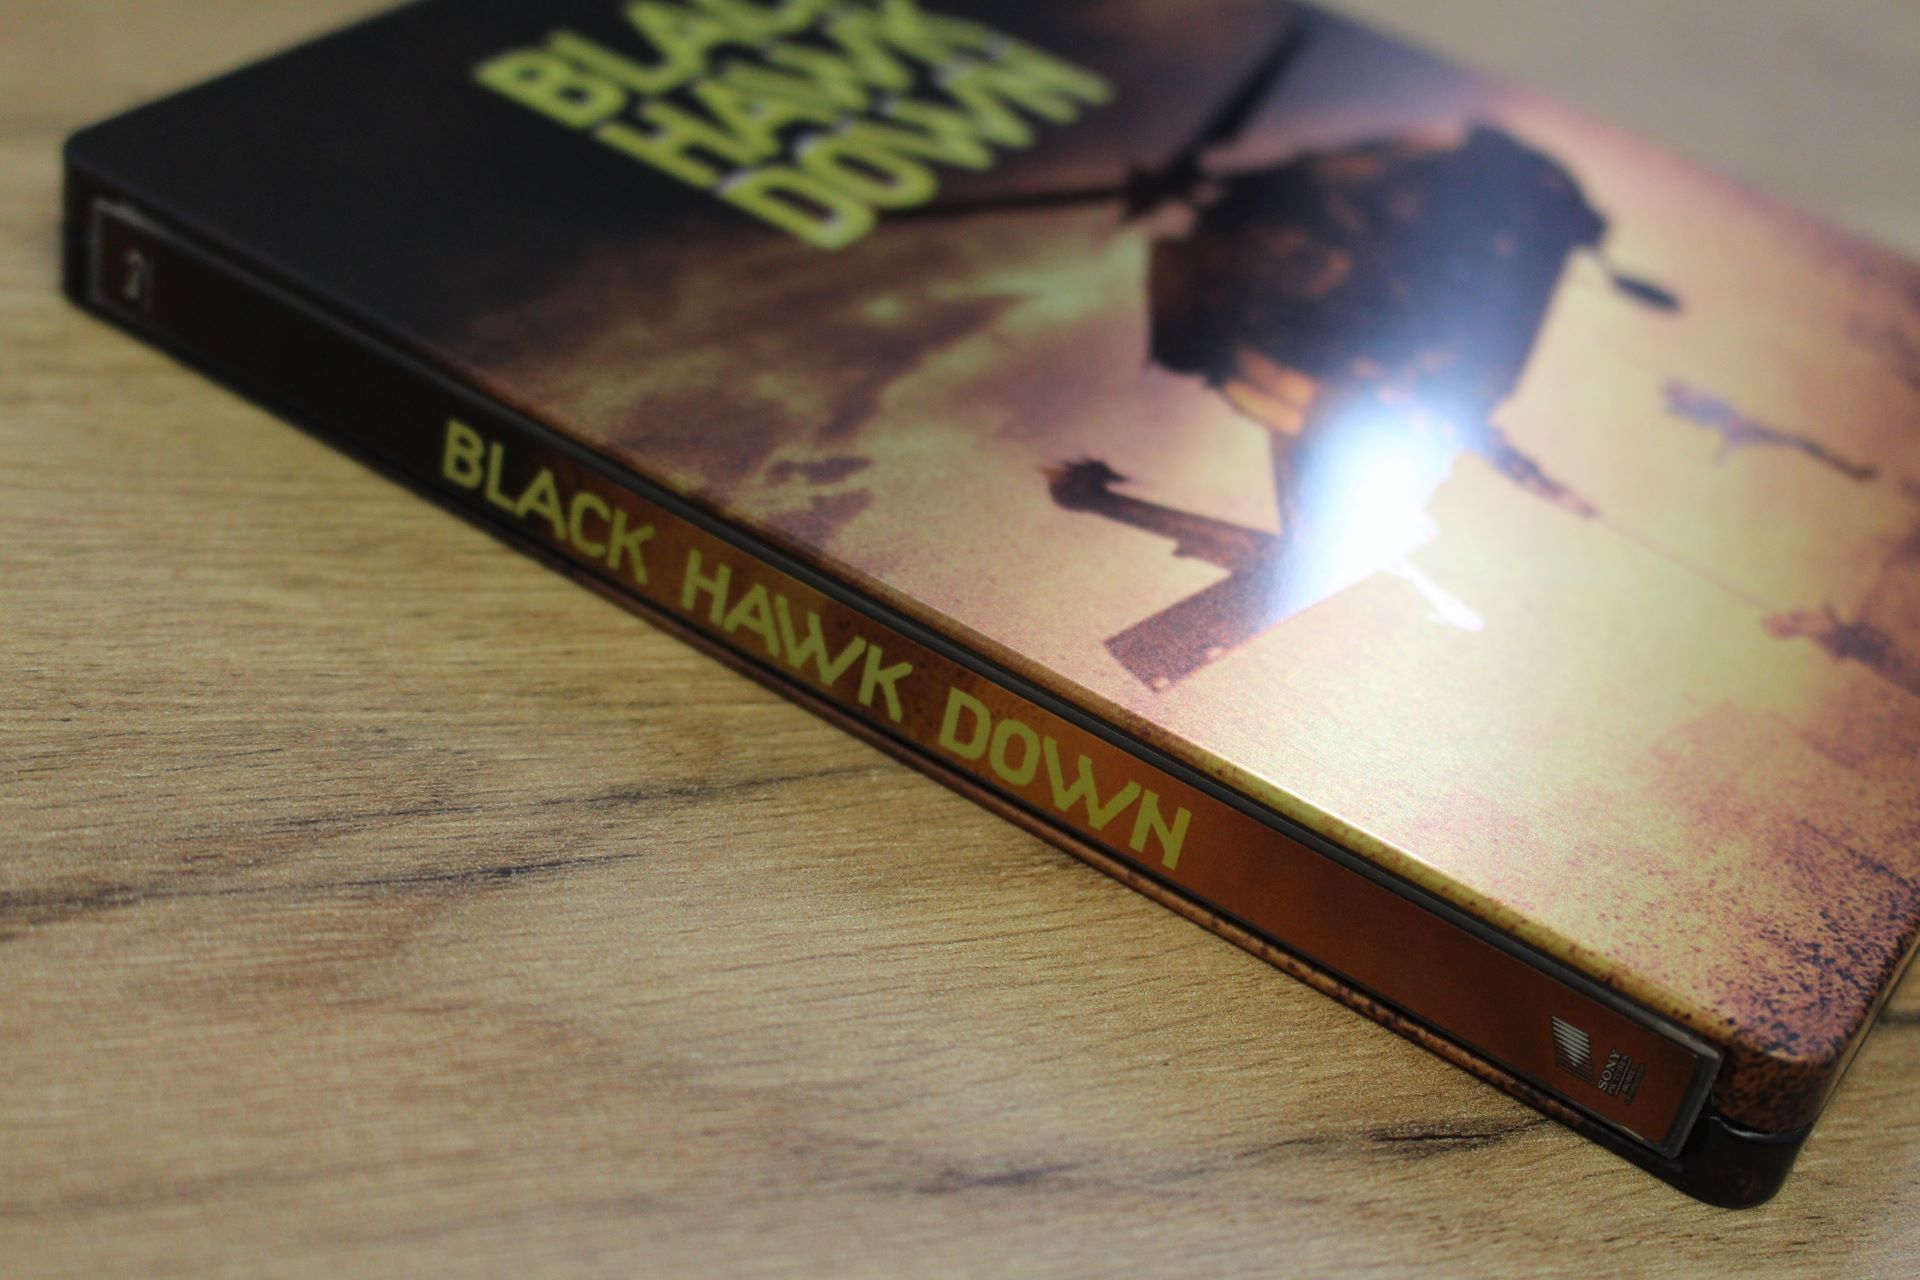 Black-Hawk-Down-steelbook-filmarena3